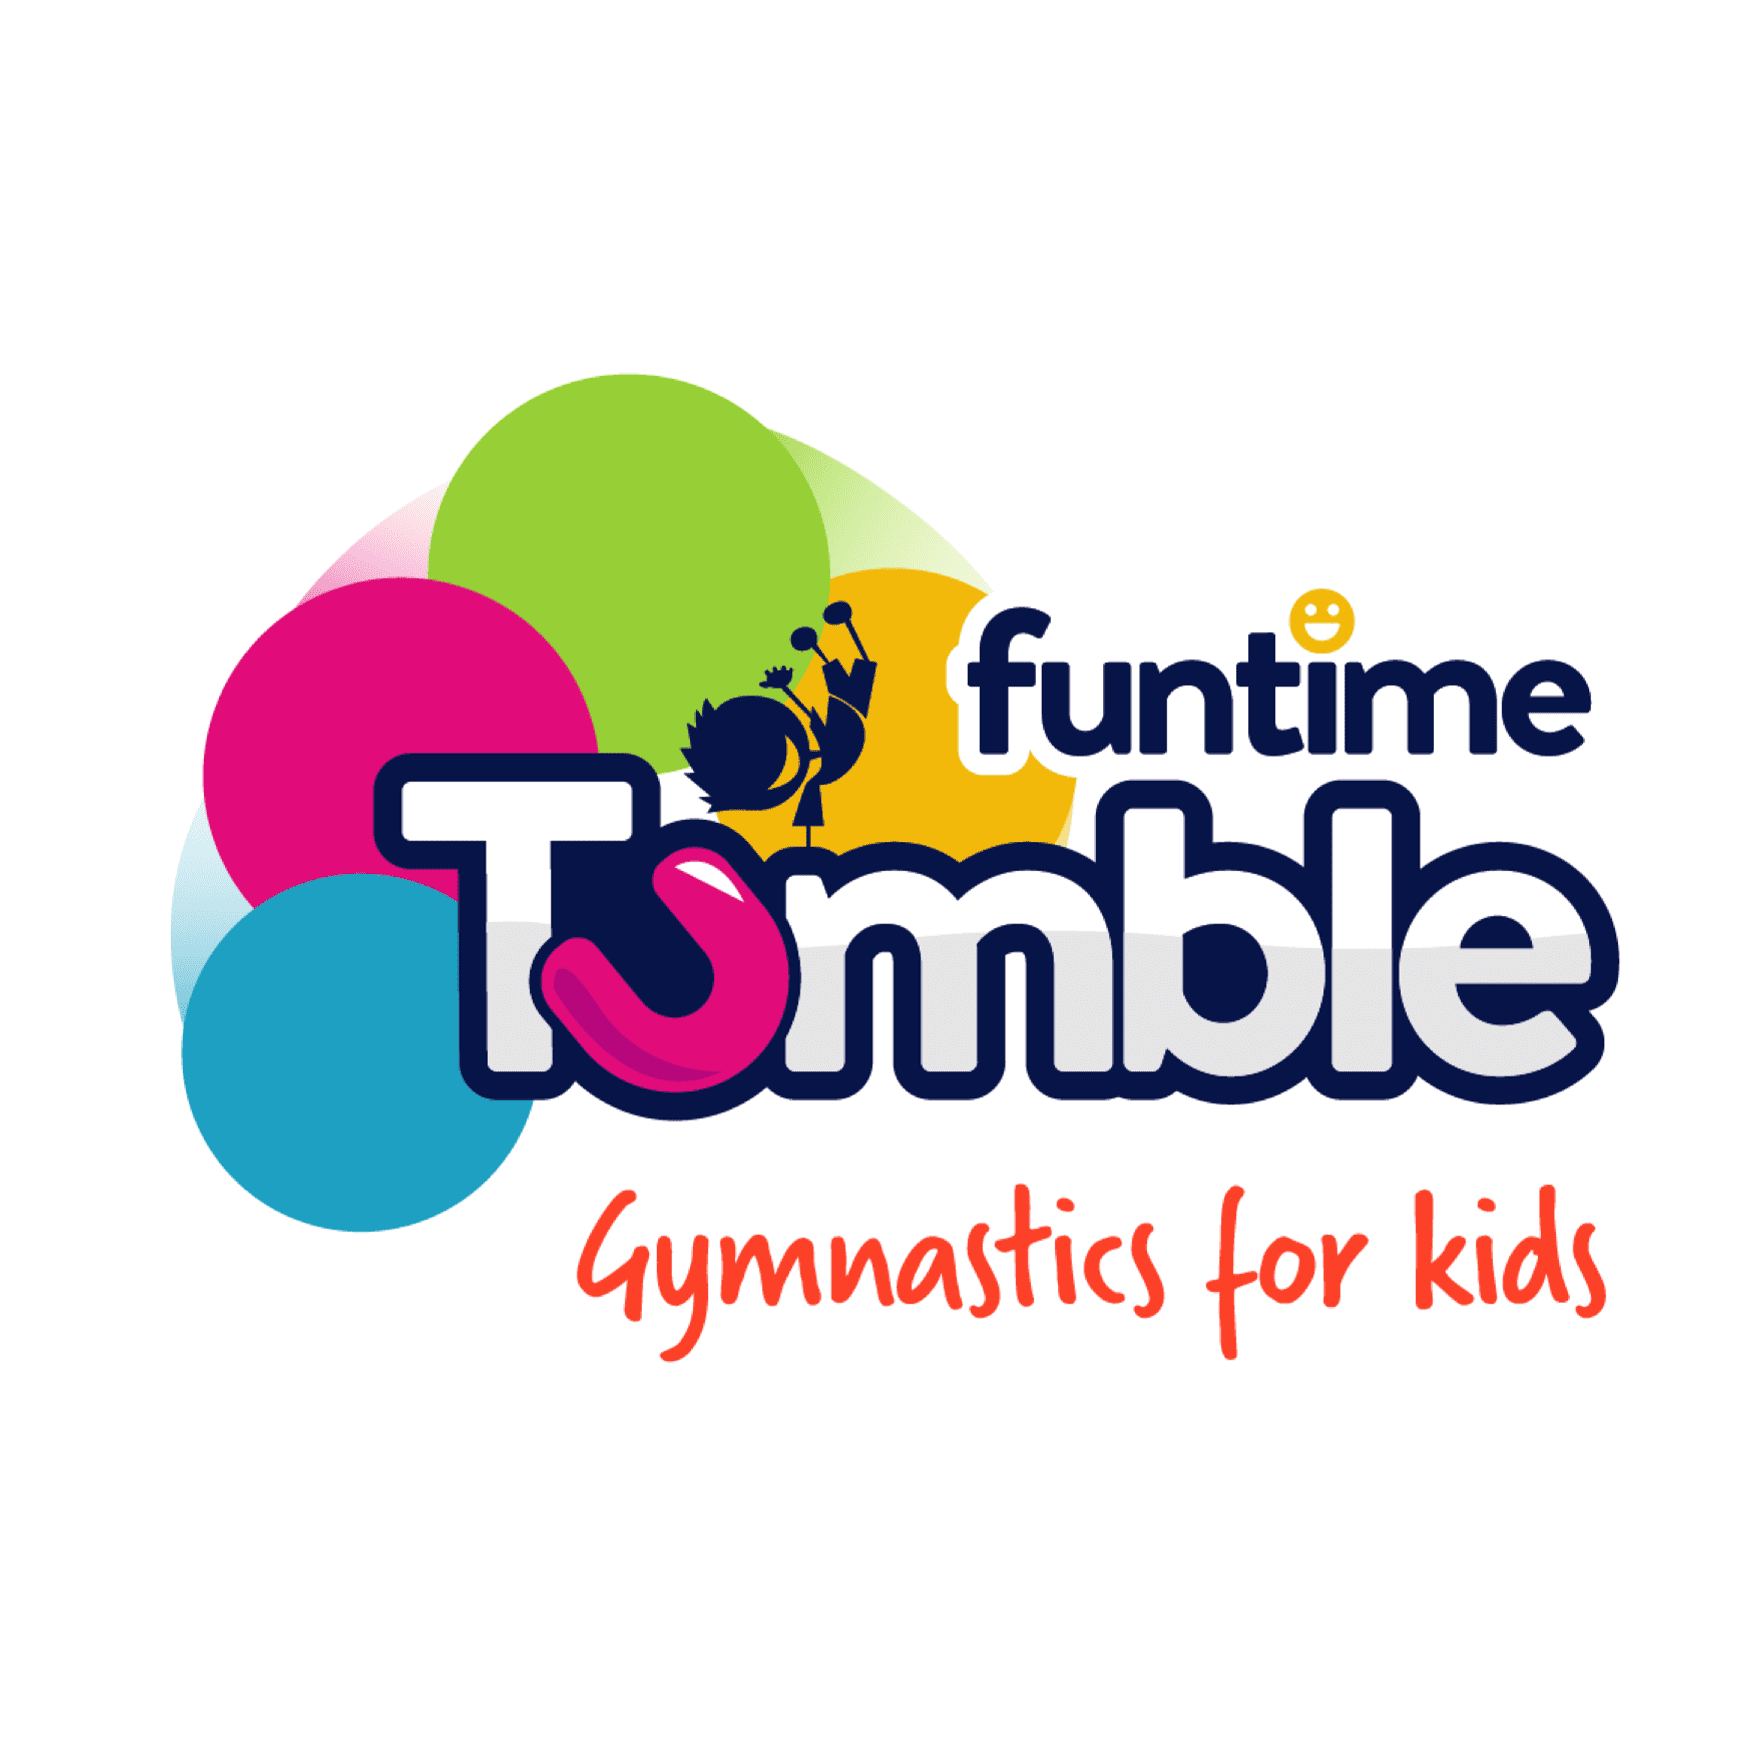 Funtime - Gymnastics for Kids